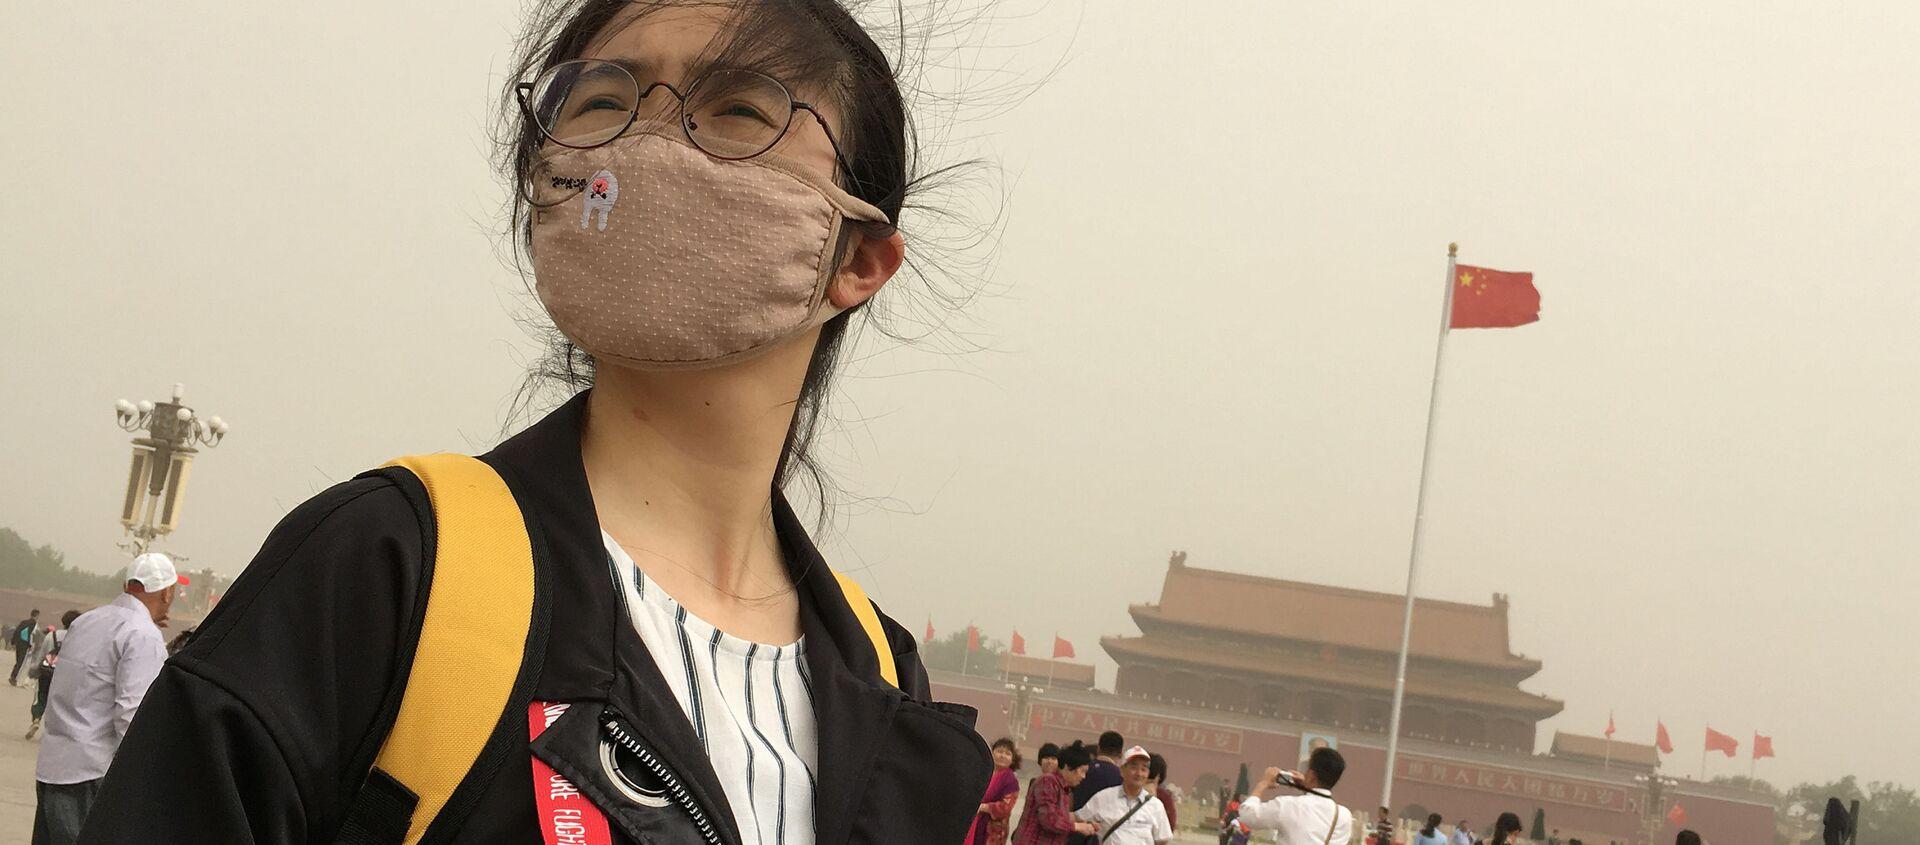 Девушка в маске от смога на площади Таньянмень в центре Пекина - Sputnik Việt Nam, 1920, 22.06.2020